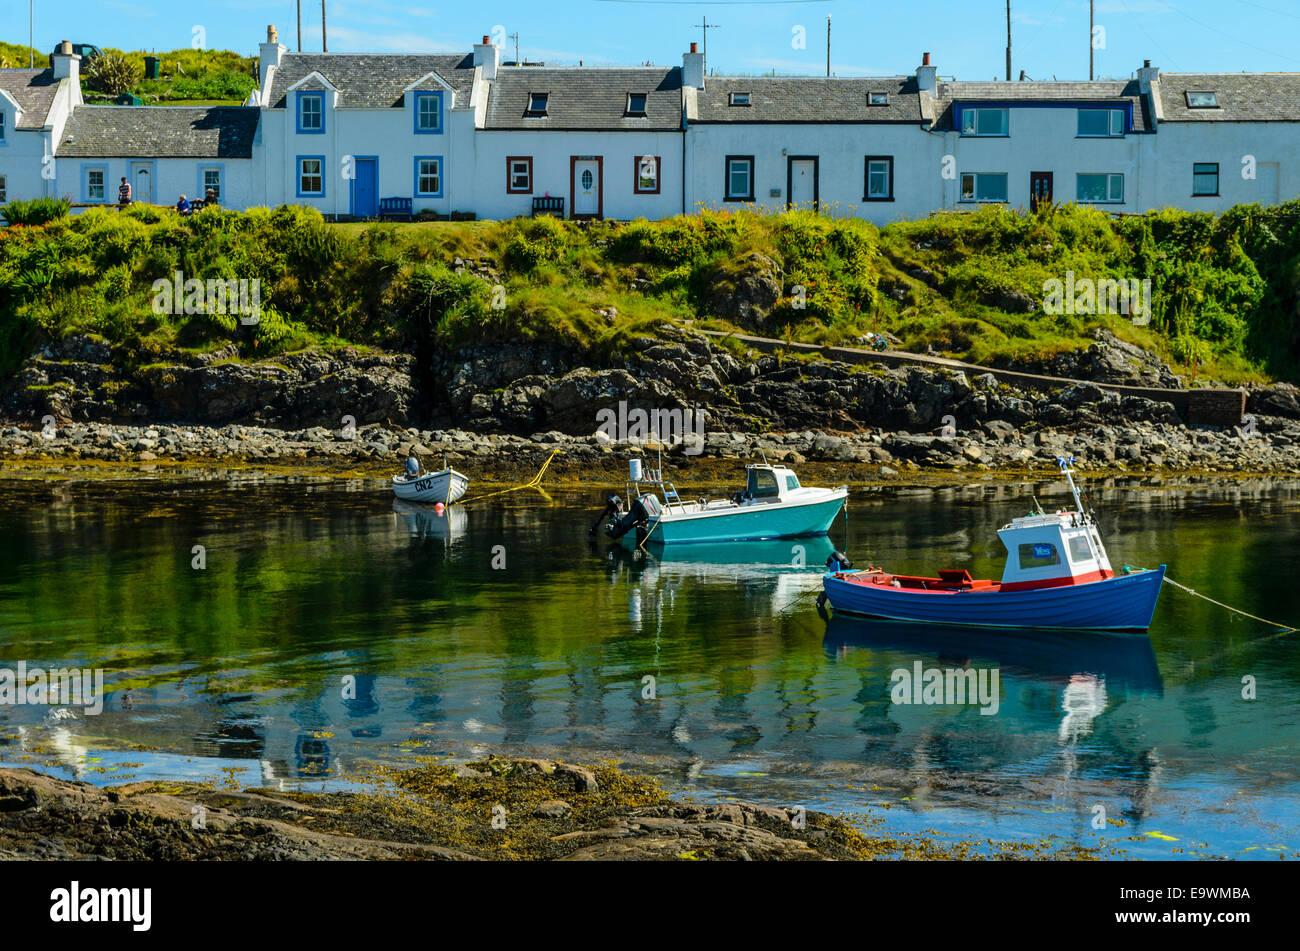 Fishing boats at Portnahaven on the island of Islay Scotland - Stock Image